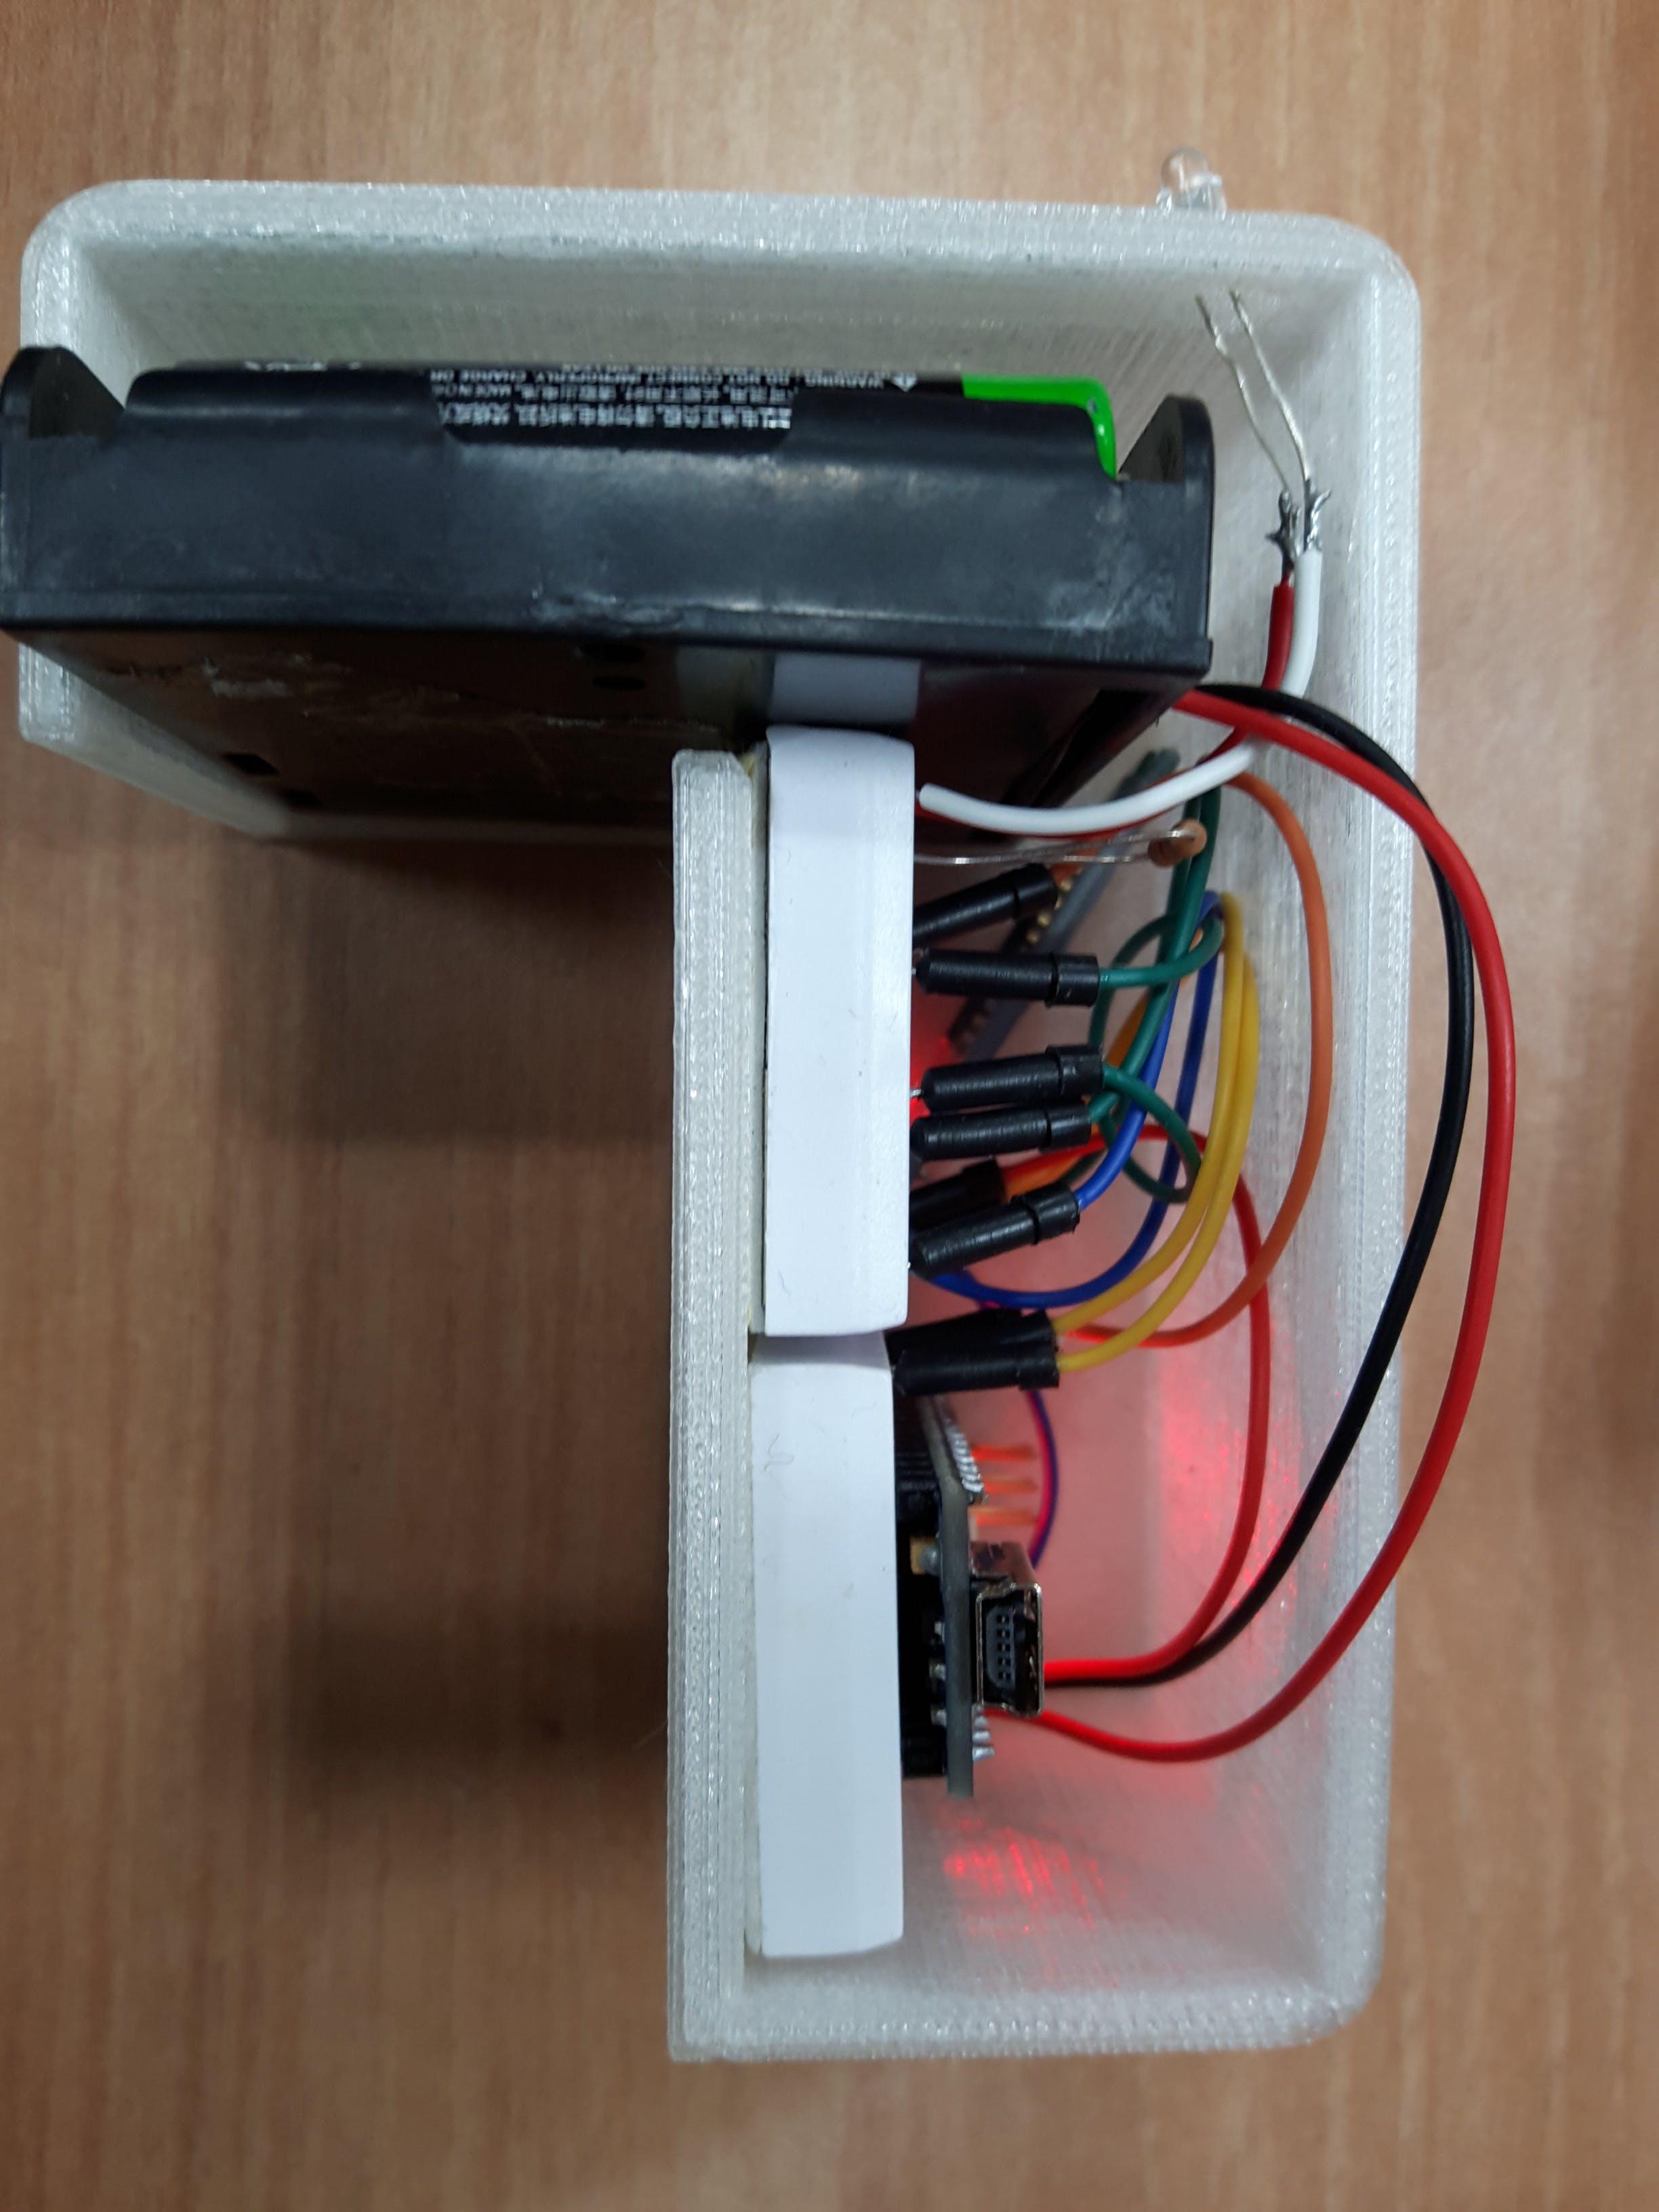 Inside the Signal converter